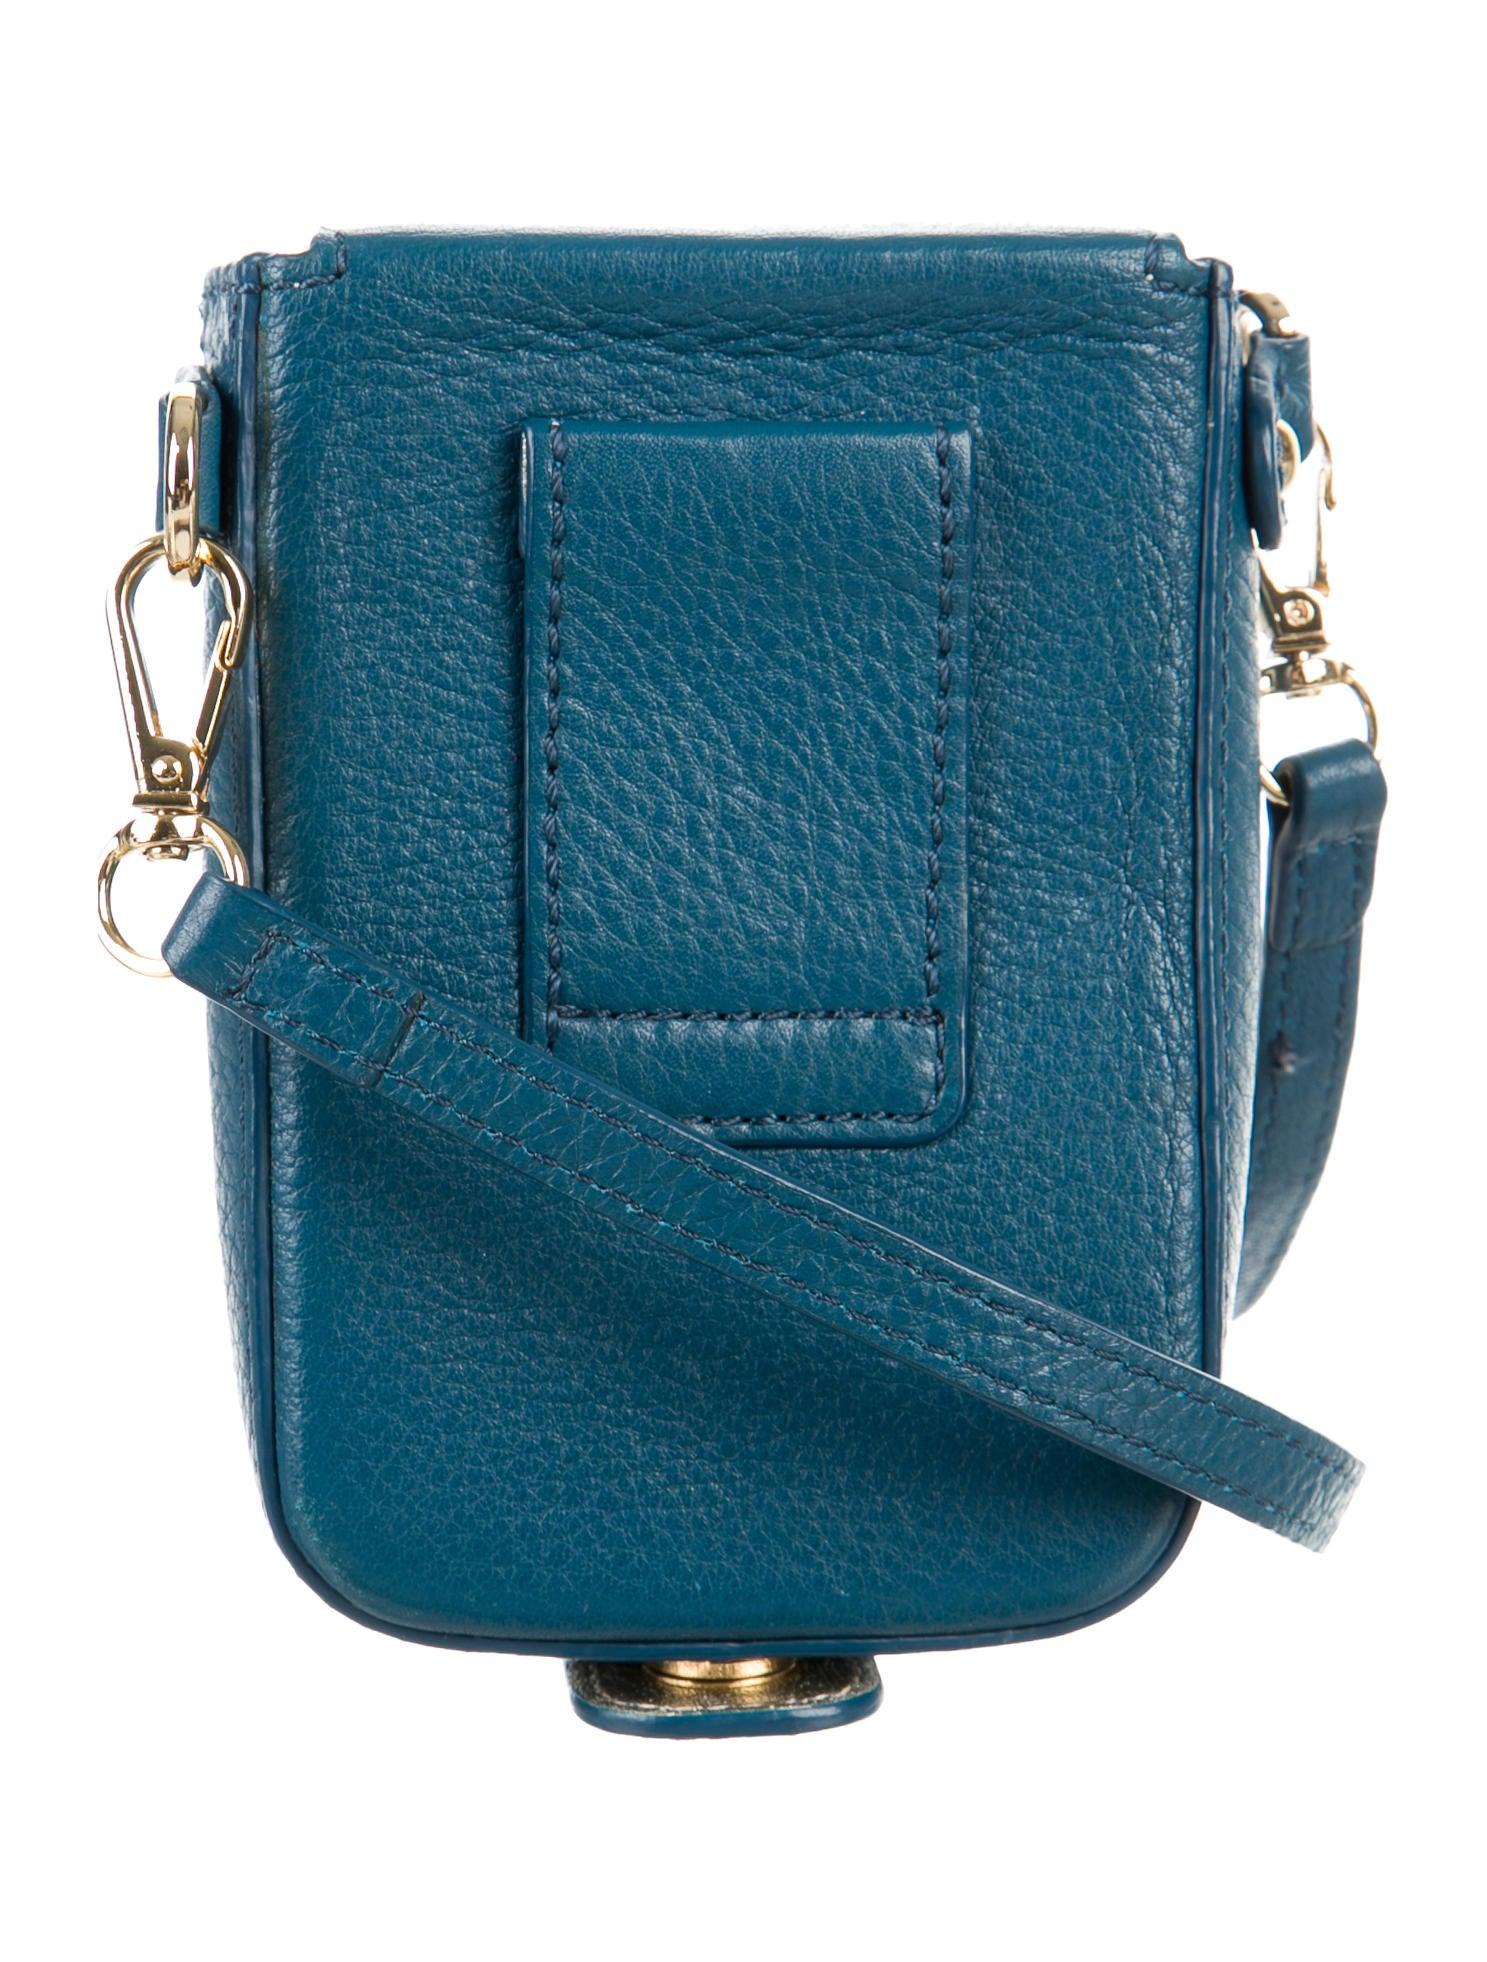 a437271cdcaa Michael Michael Kors Pebbled Leather Phone Crossbody Bag | Stanford ...